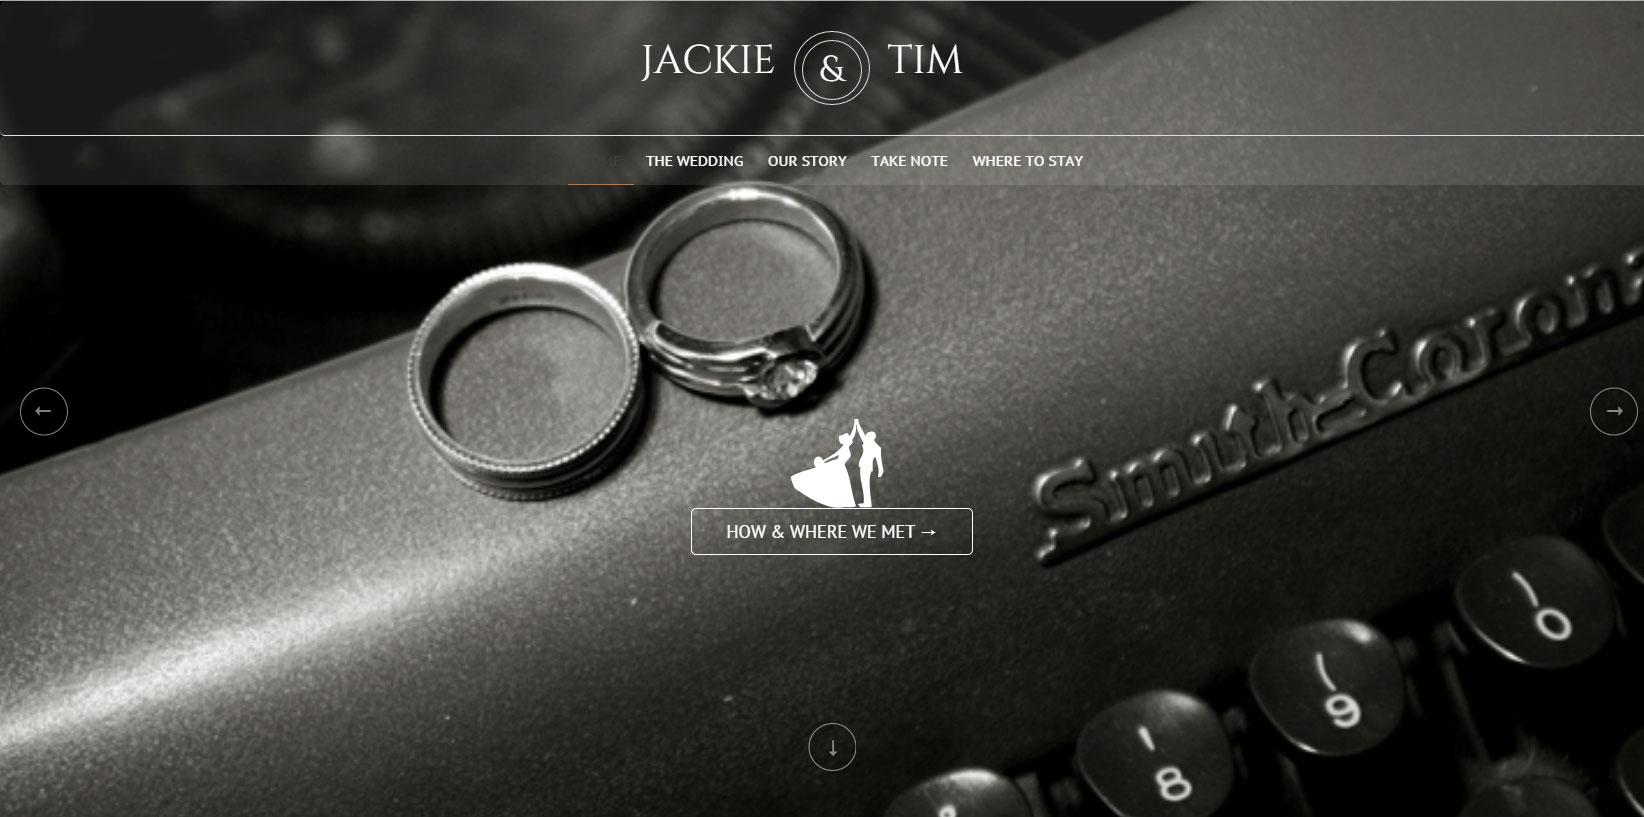 jackie_and_tim